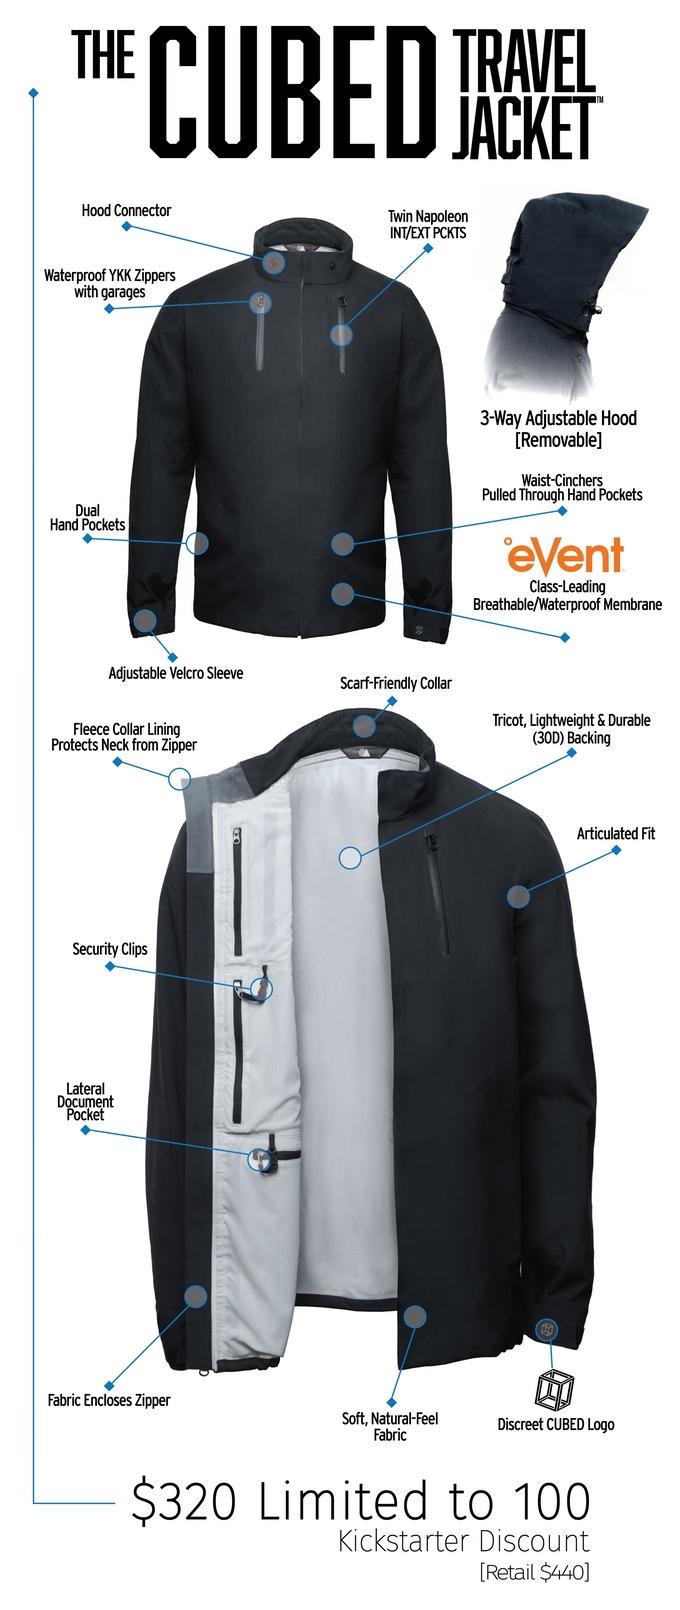 Cubed jacket